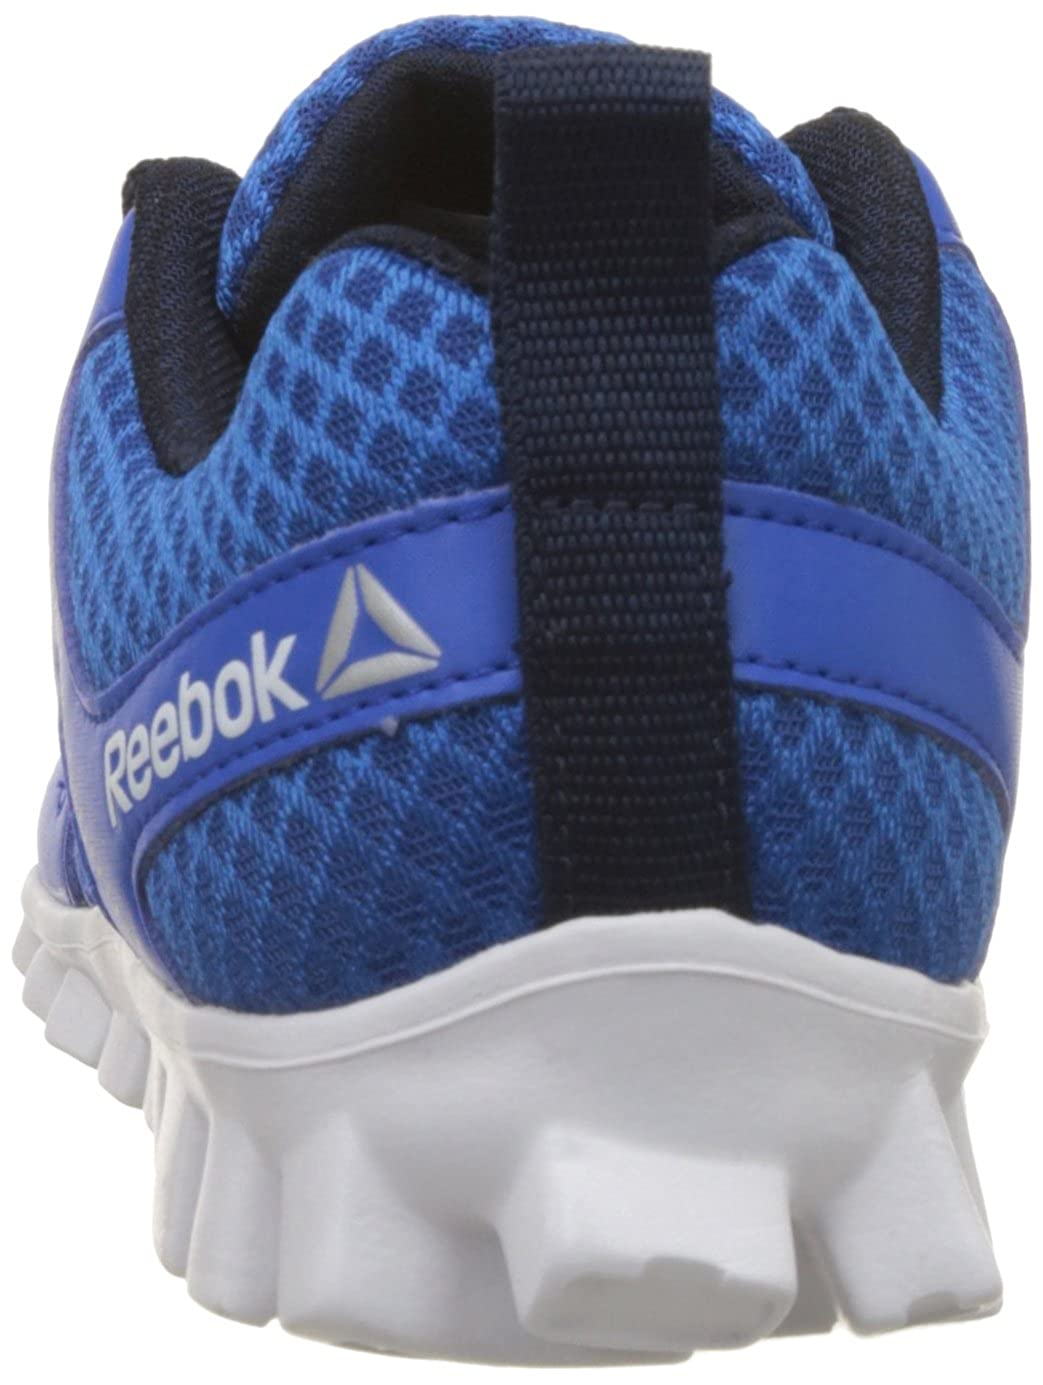 Reebok Boys Arcade Runner Blue 2df0b2dbe